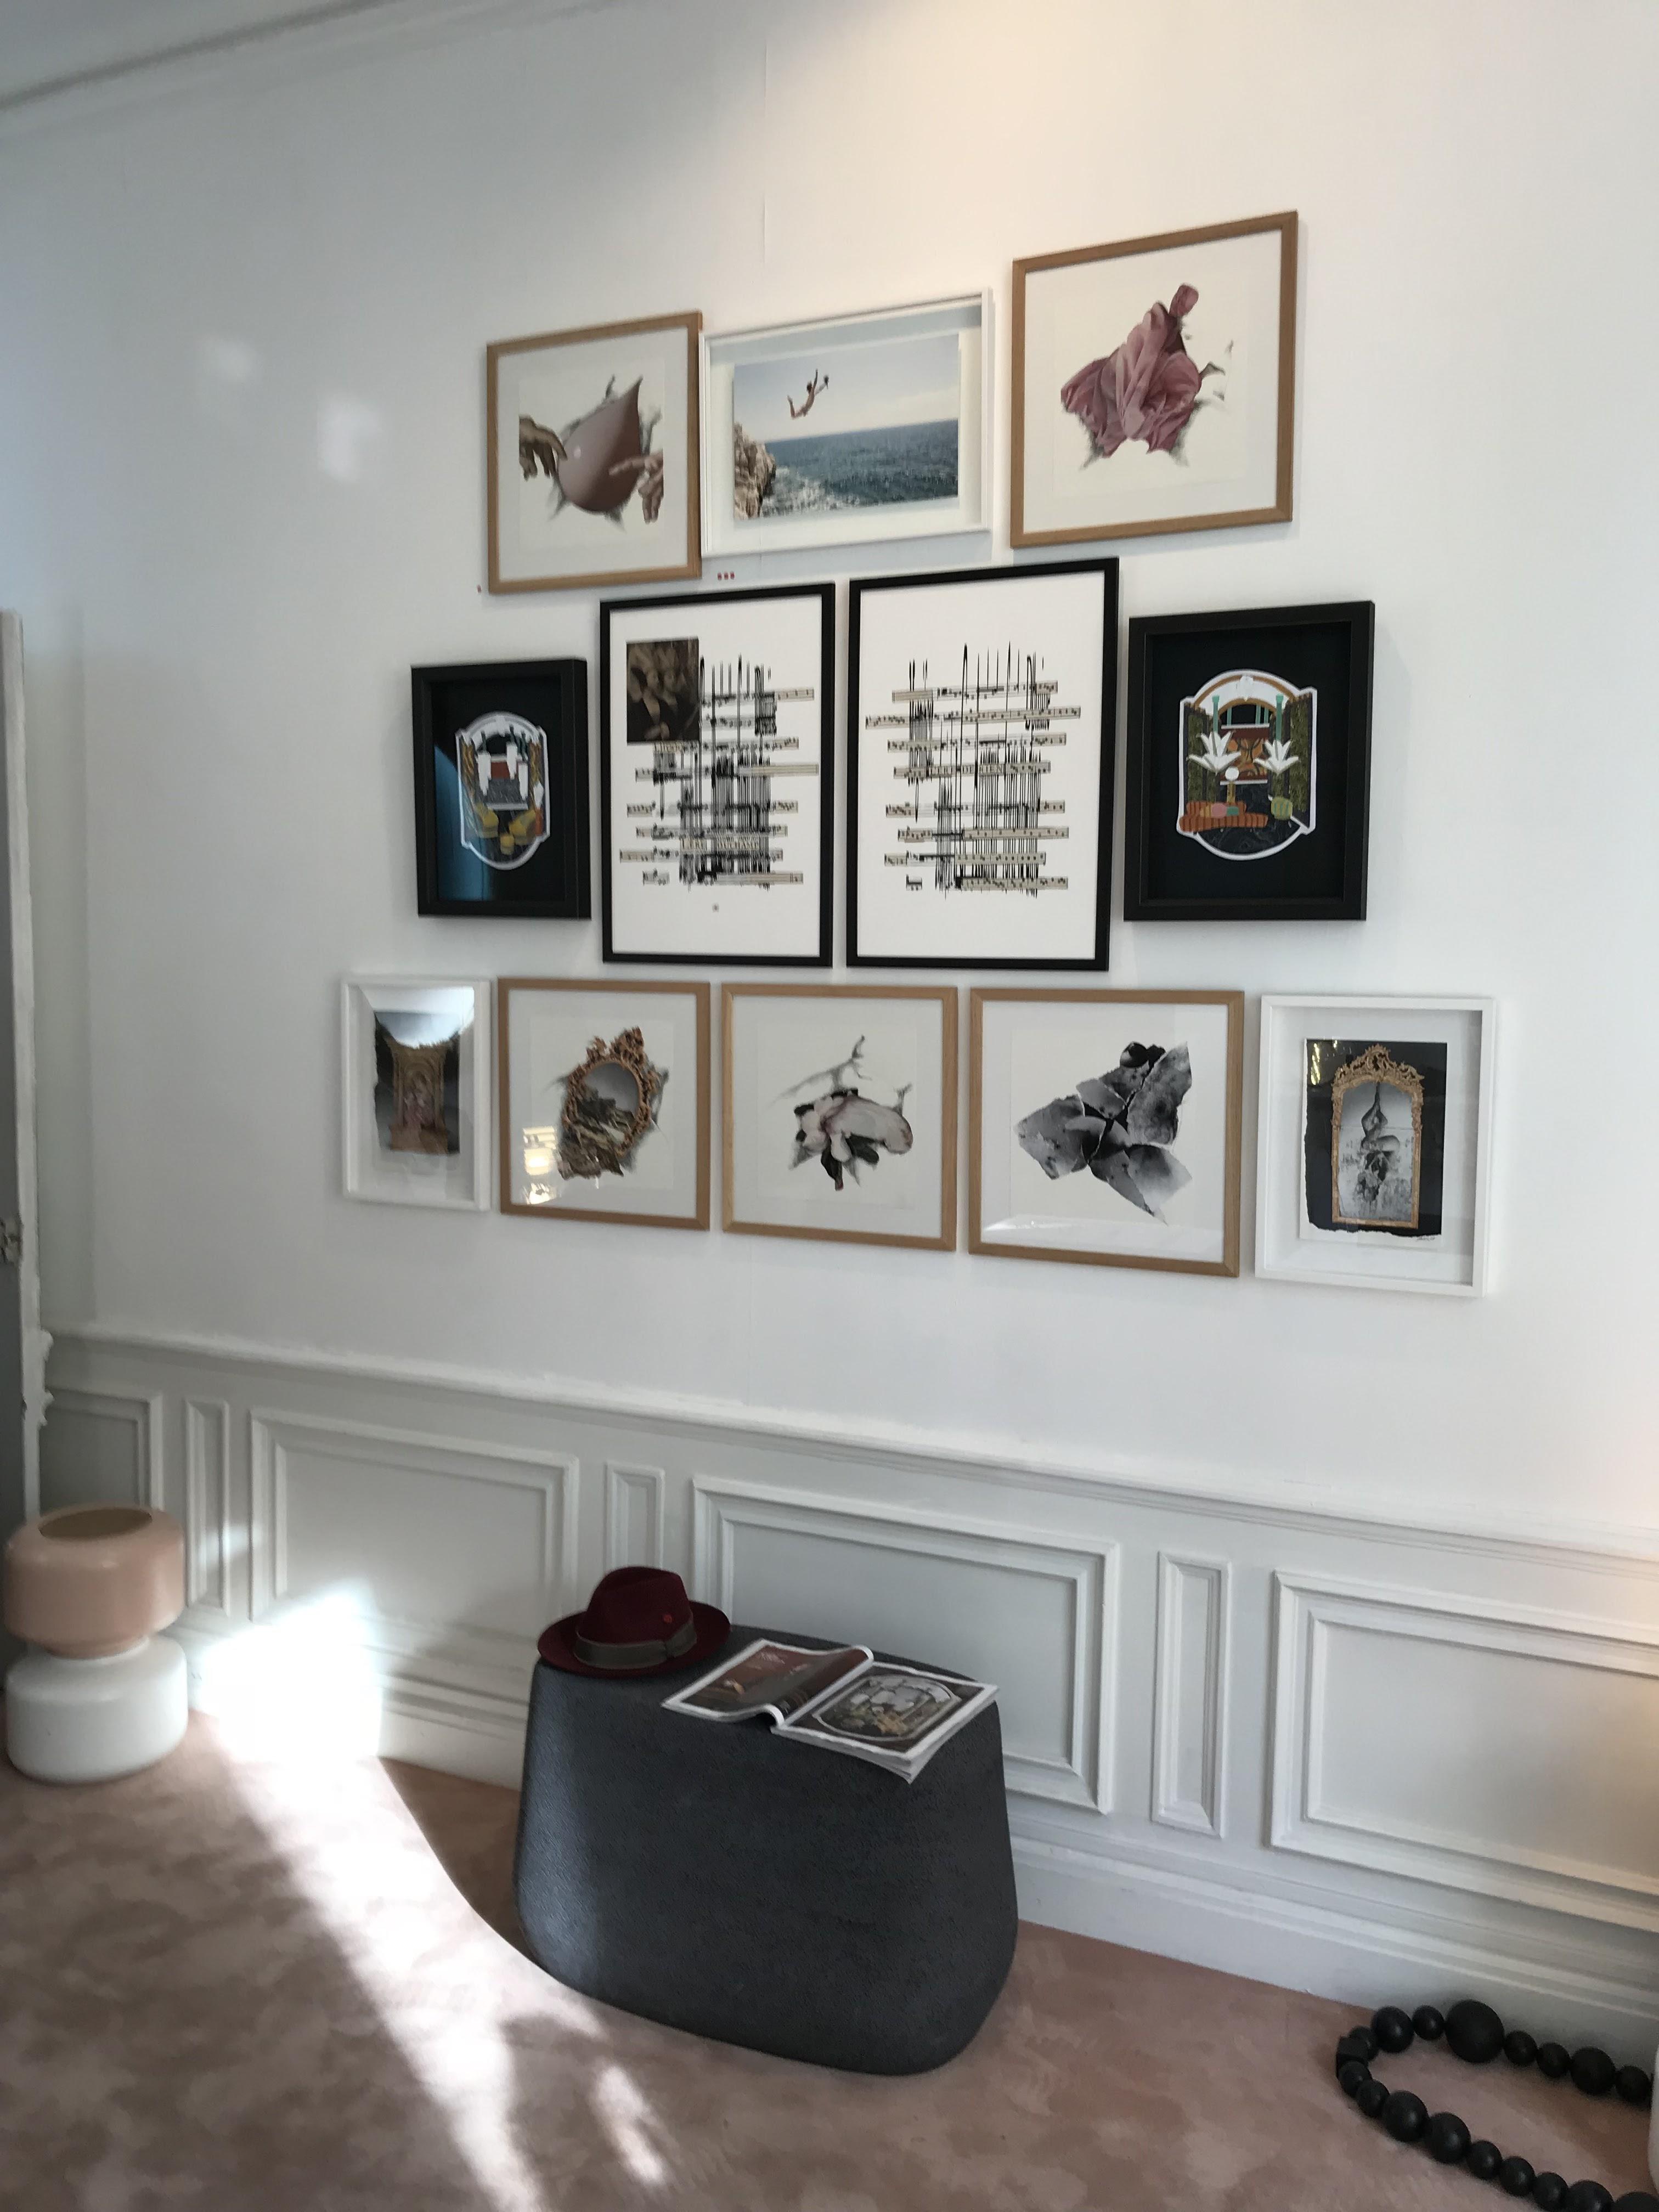 Décor Inspiration: Private Choice & Haussmannien Interiors